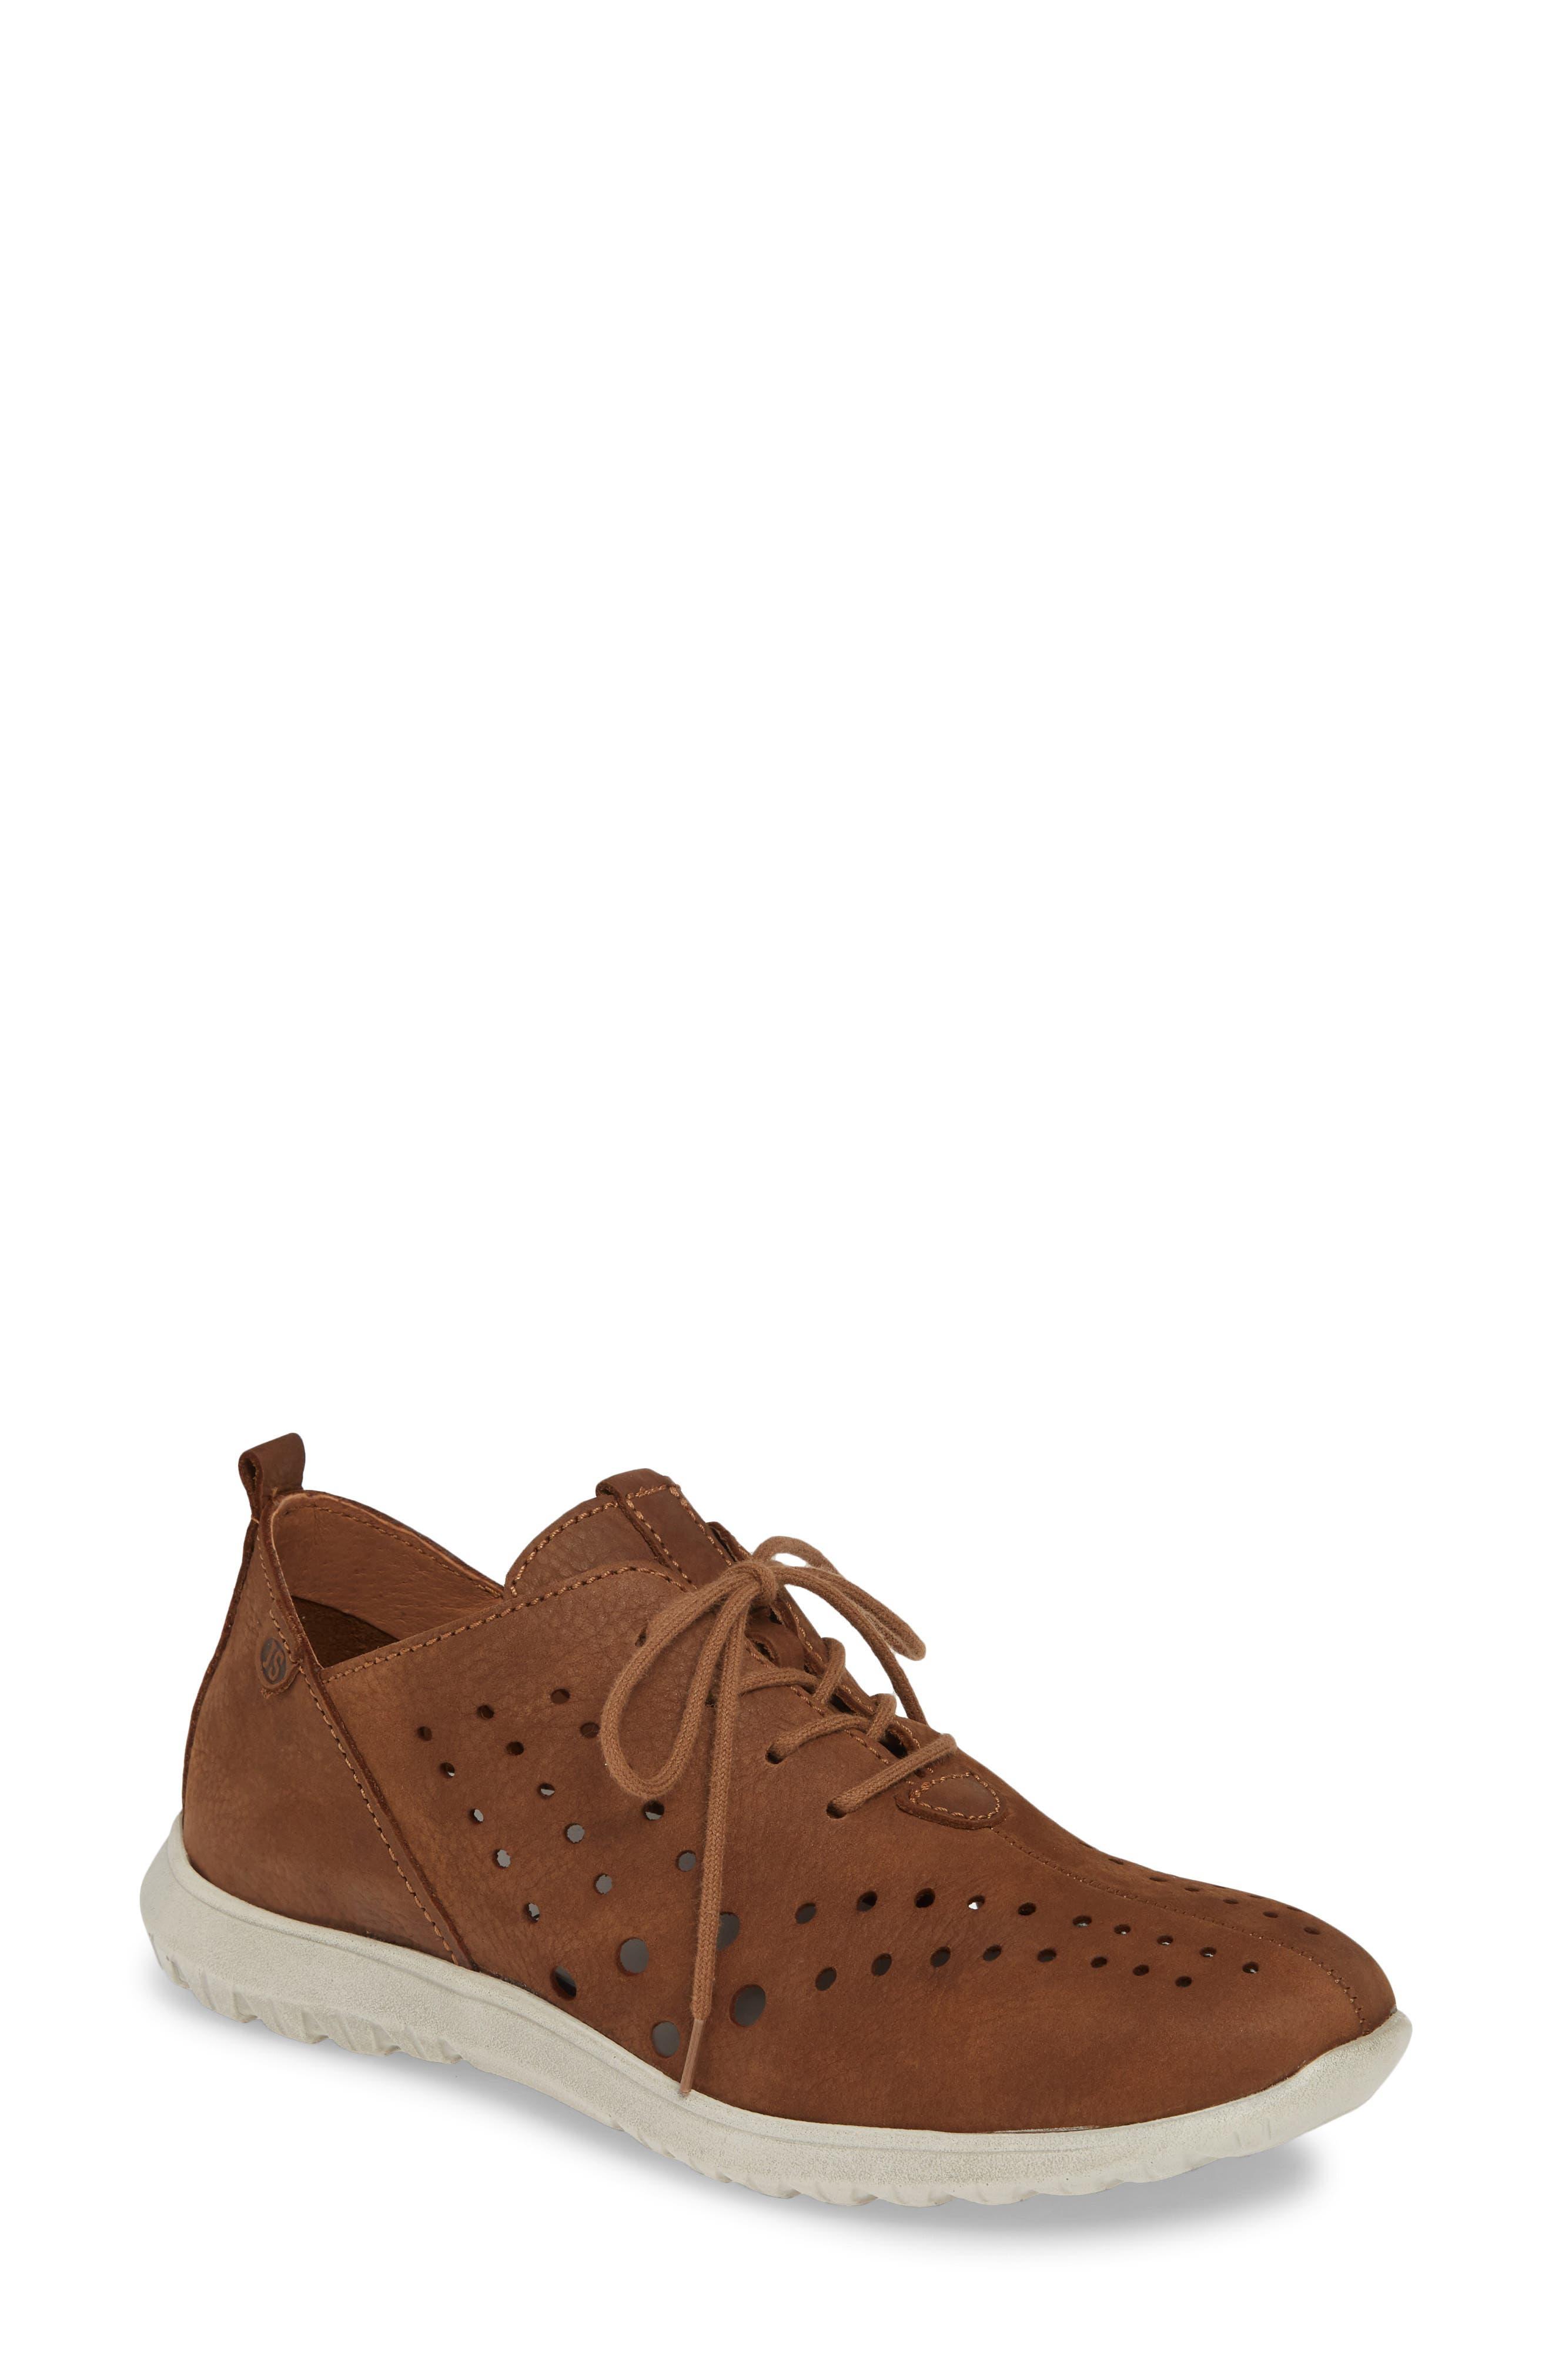 Josef Seibel Malena 09 Sneaker, Brown